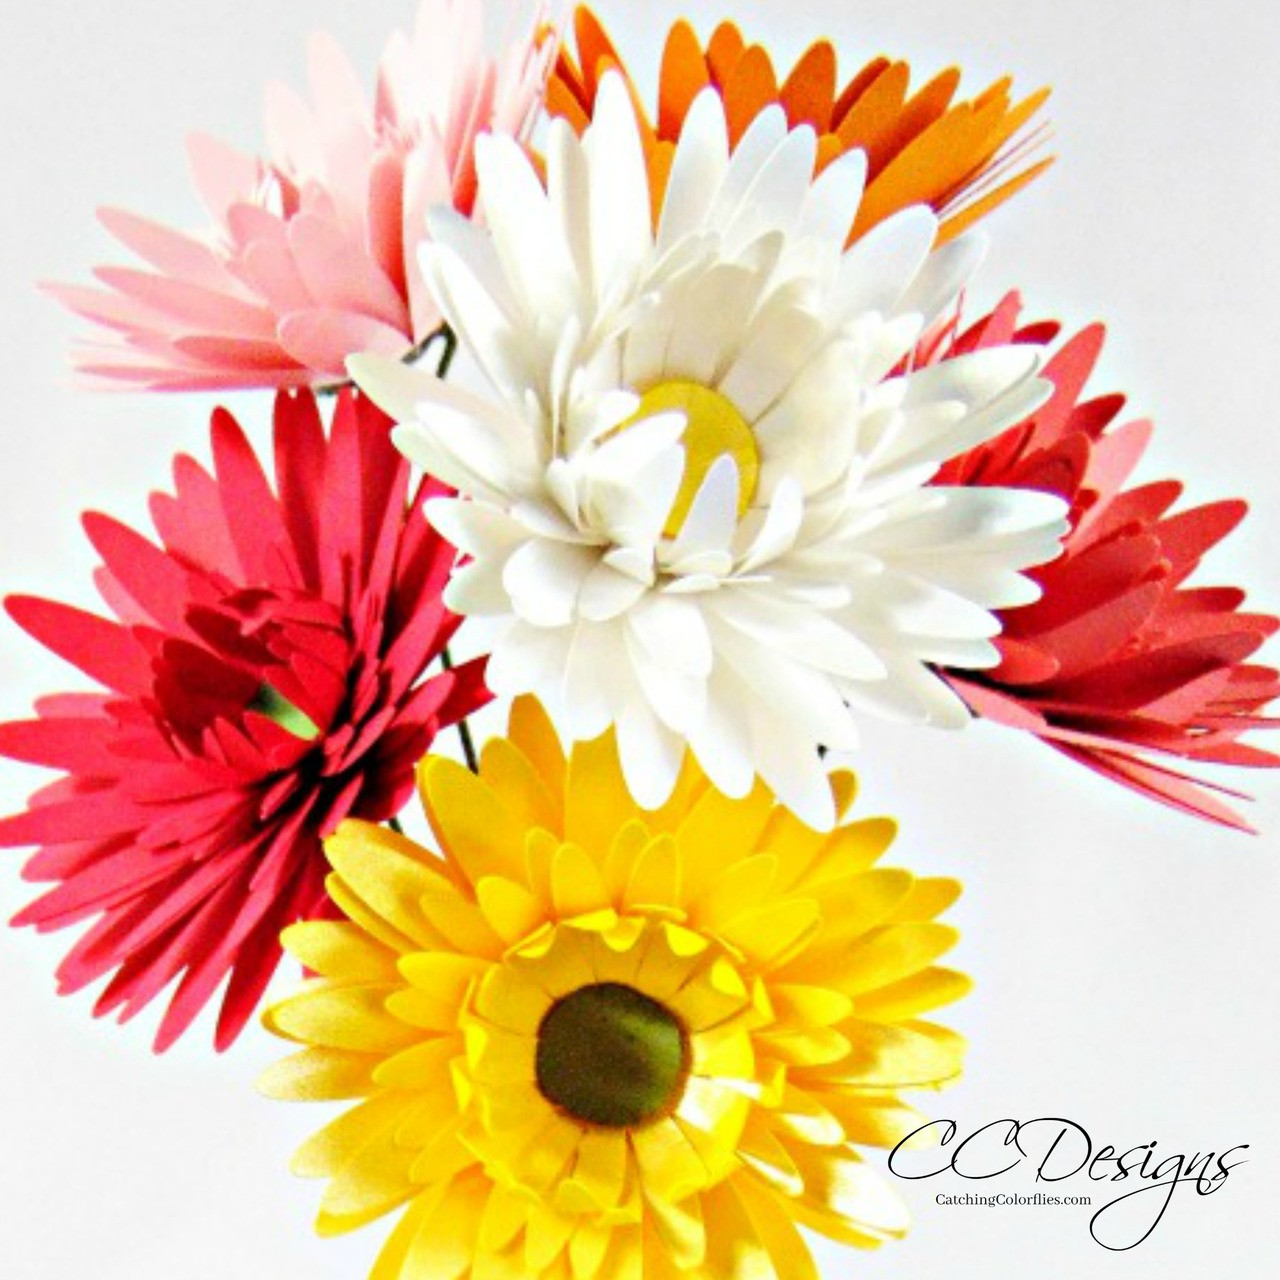 daisy paper flower - Kubre.euforic.co